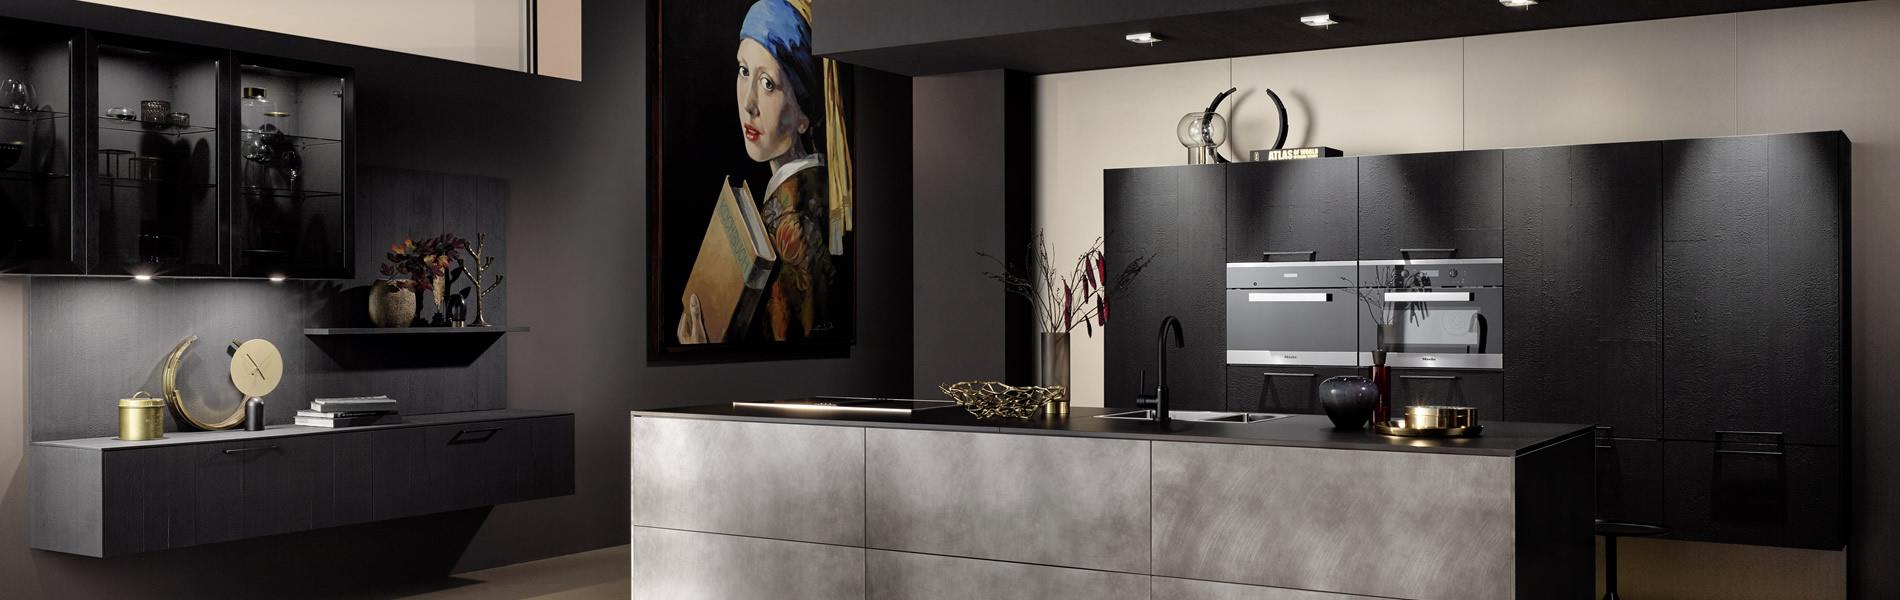 das team m ller die k che. Black Bedroom Furniture Sets. Home Design Ideas